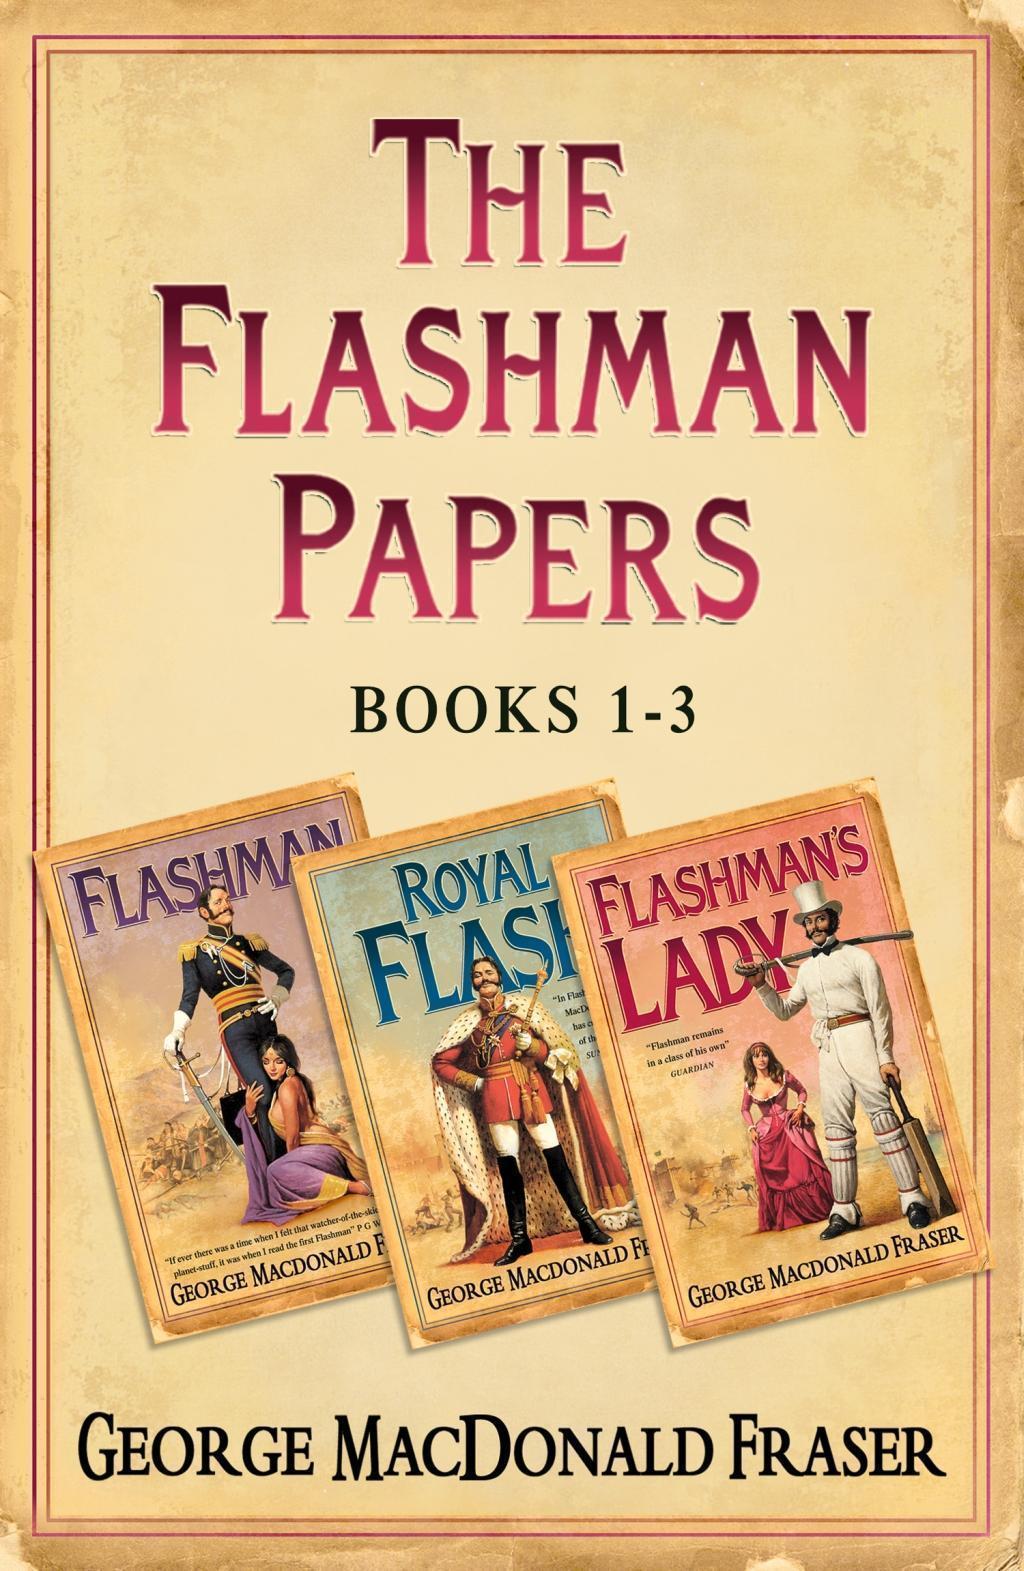 Flashman Papers 3-Book Collection 1: Flashman, Royal Flash, Flashman's Lady